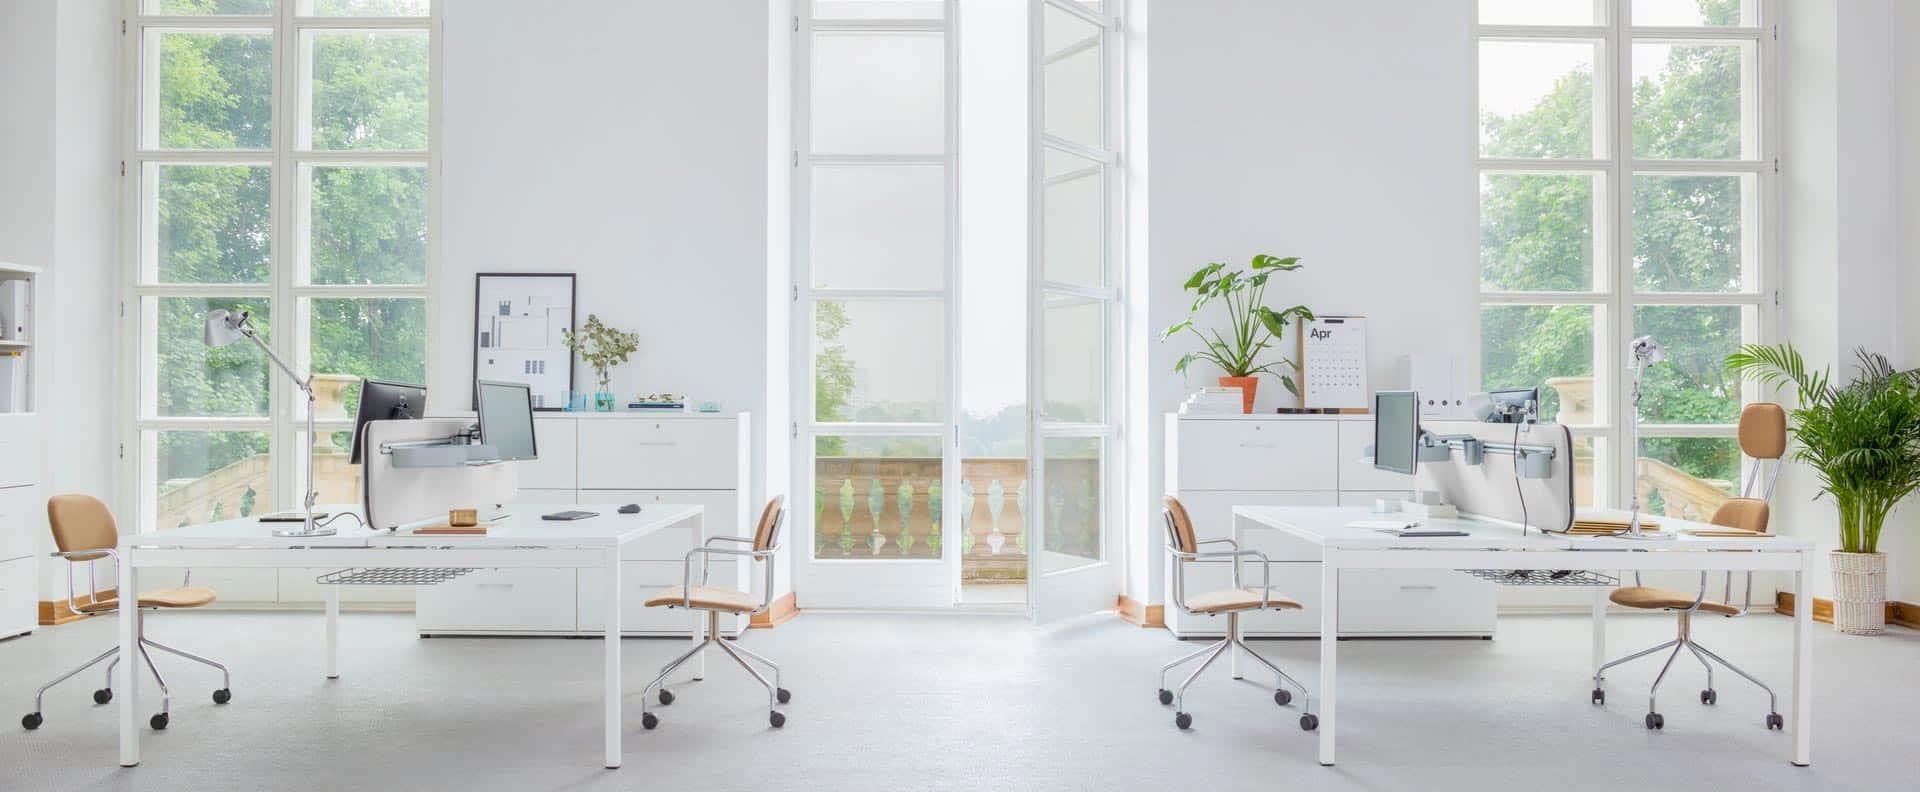 mobilier de bureau à Caen (Calvados -14) en Normandie - MDD Countertop Office Divider 8